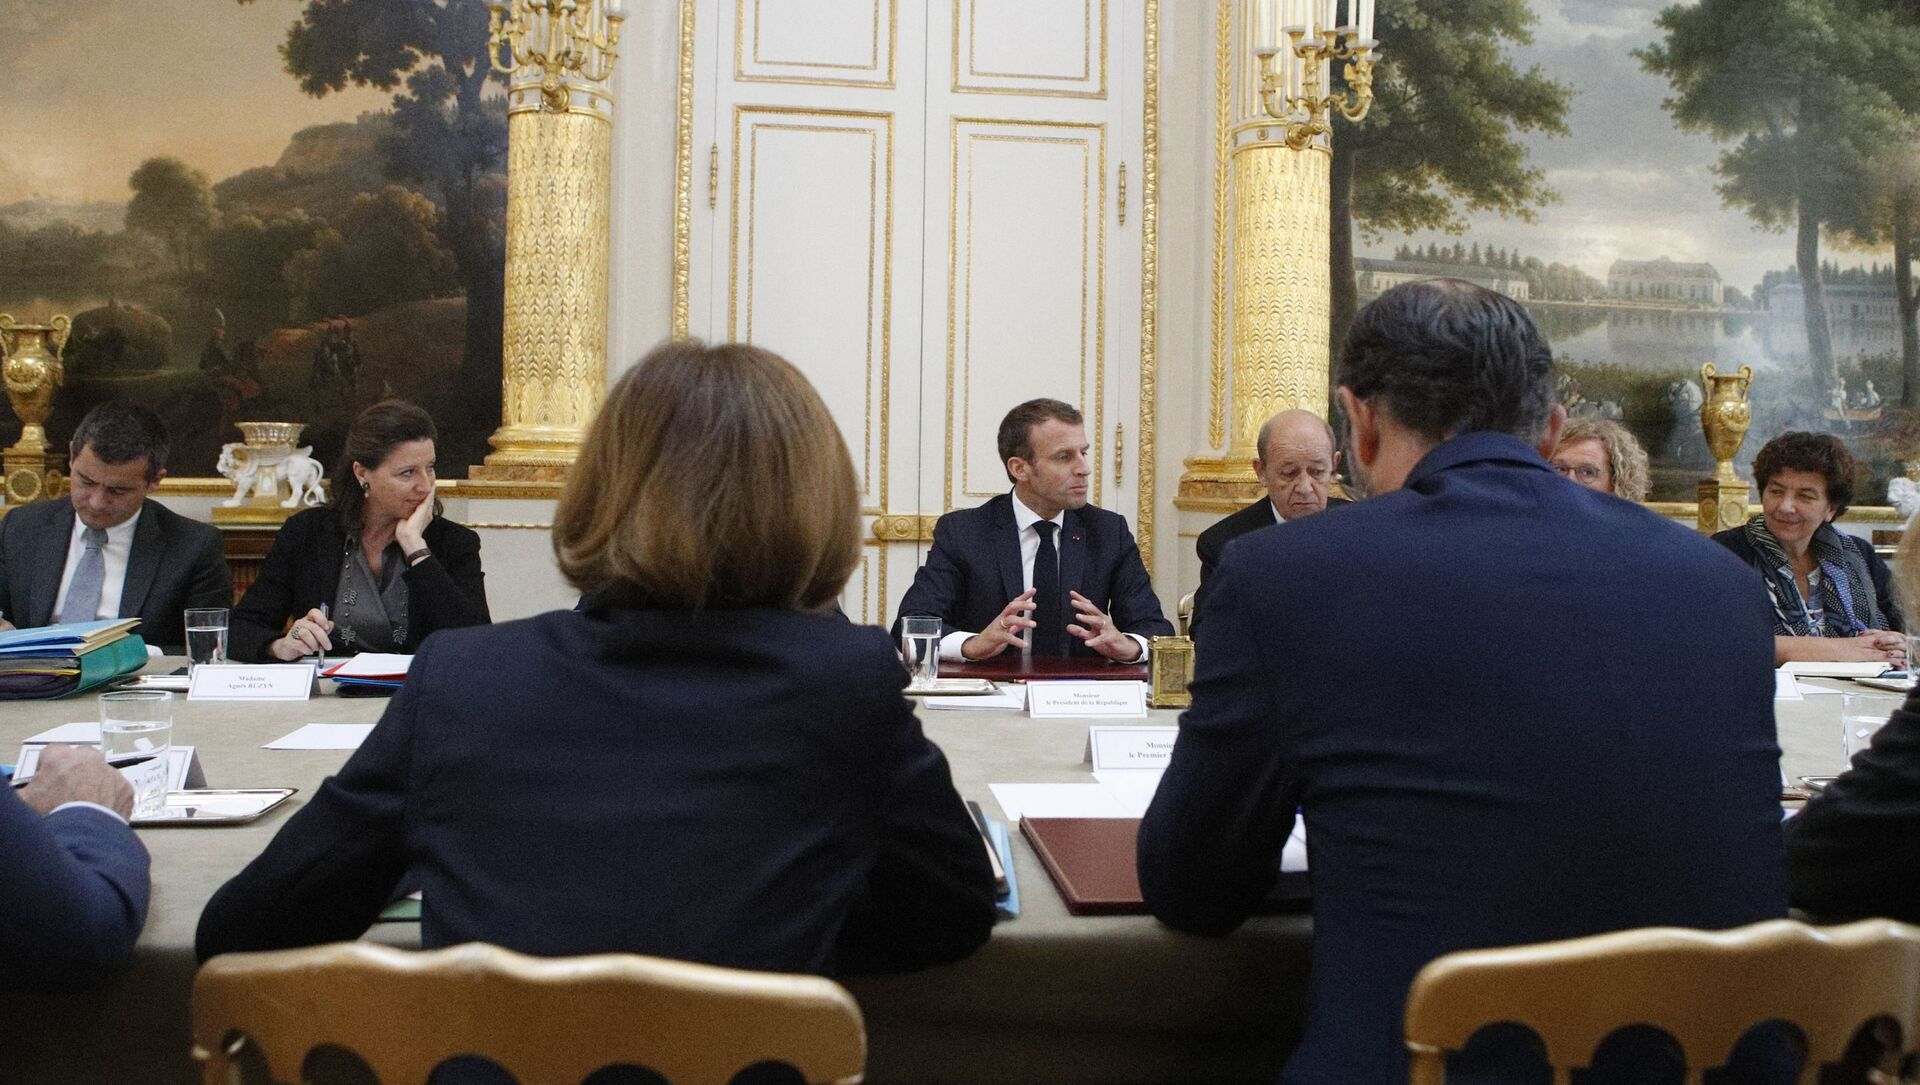 Emmanuel Macron en conseil des ministres - Sputnik France, 1920, 27.07.2021